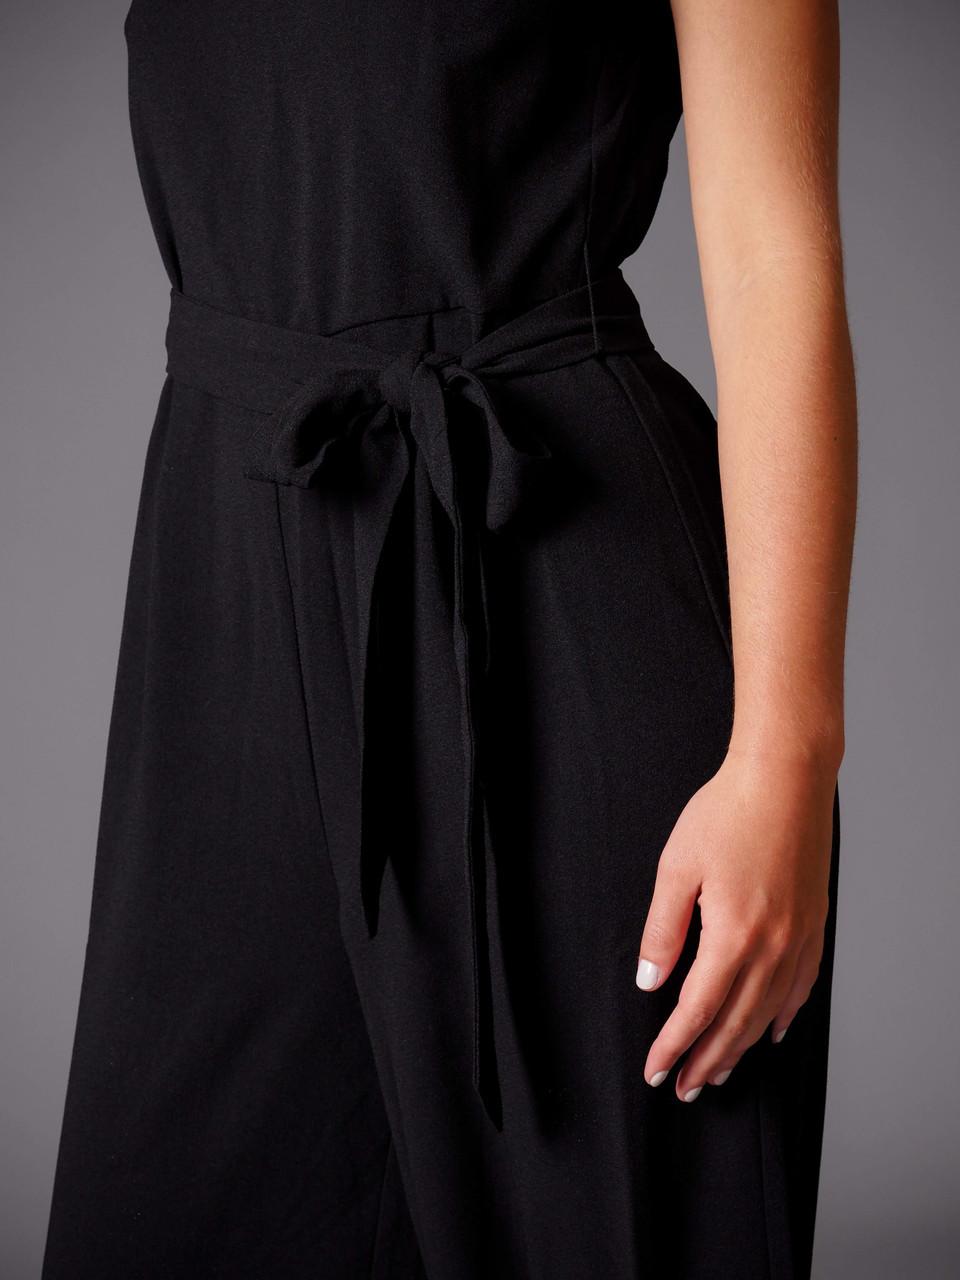 black strapless v-neck jumpsuit